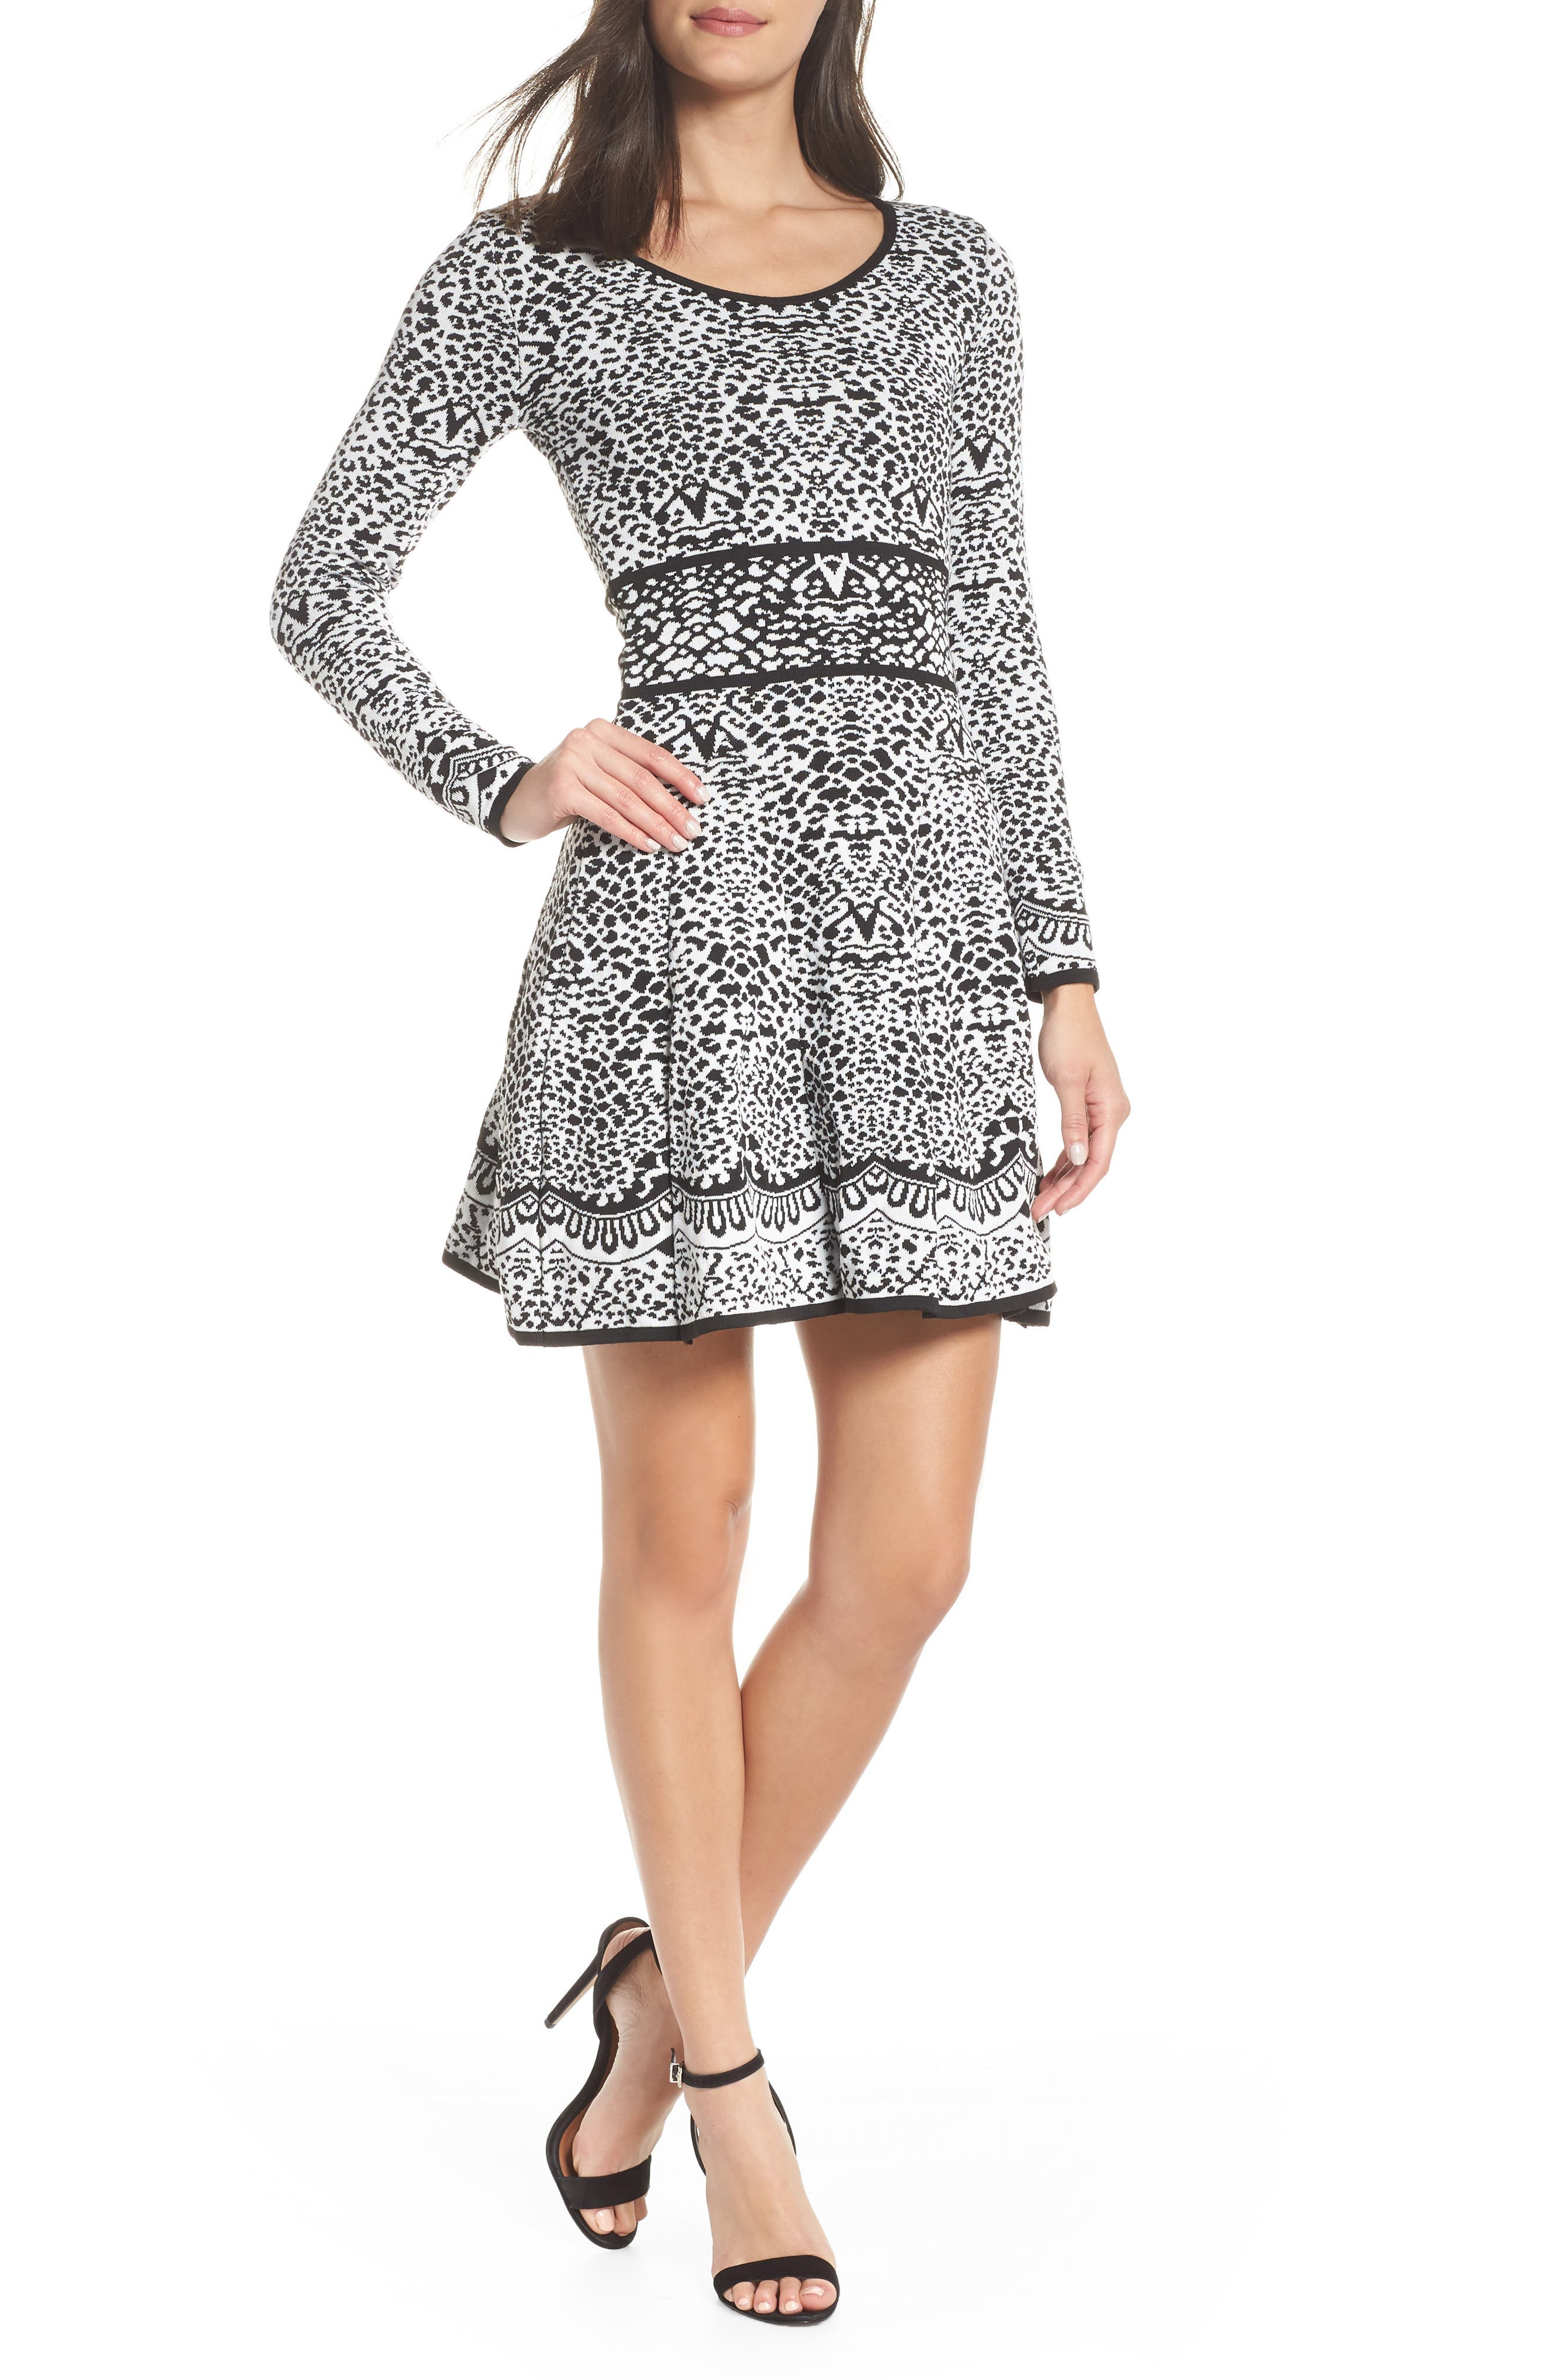 Flare Sweater Dresses